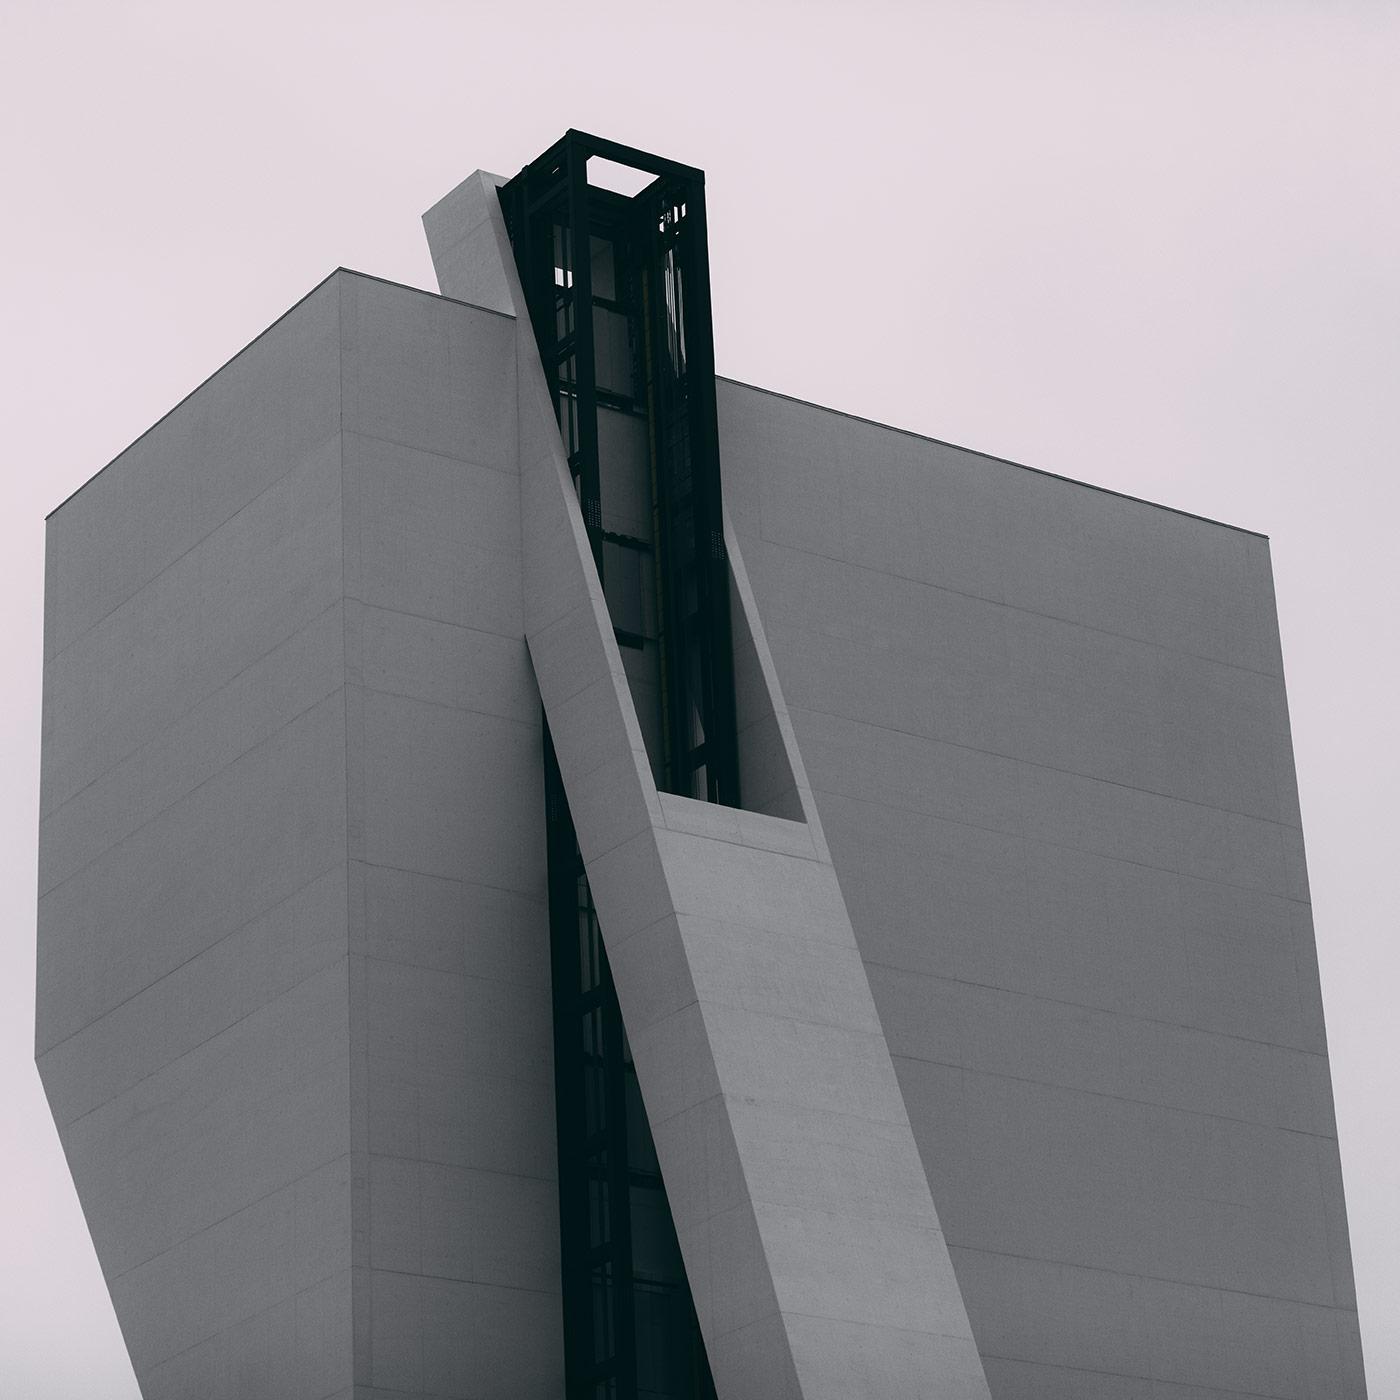 Fondazione Prada <br />Location: Milan, Italy <br />Architects: OMA